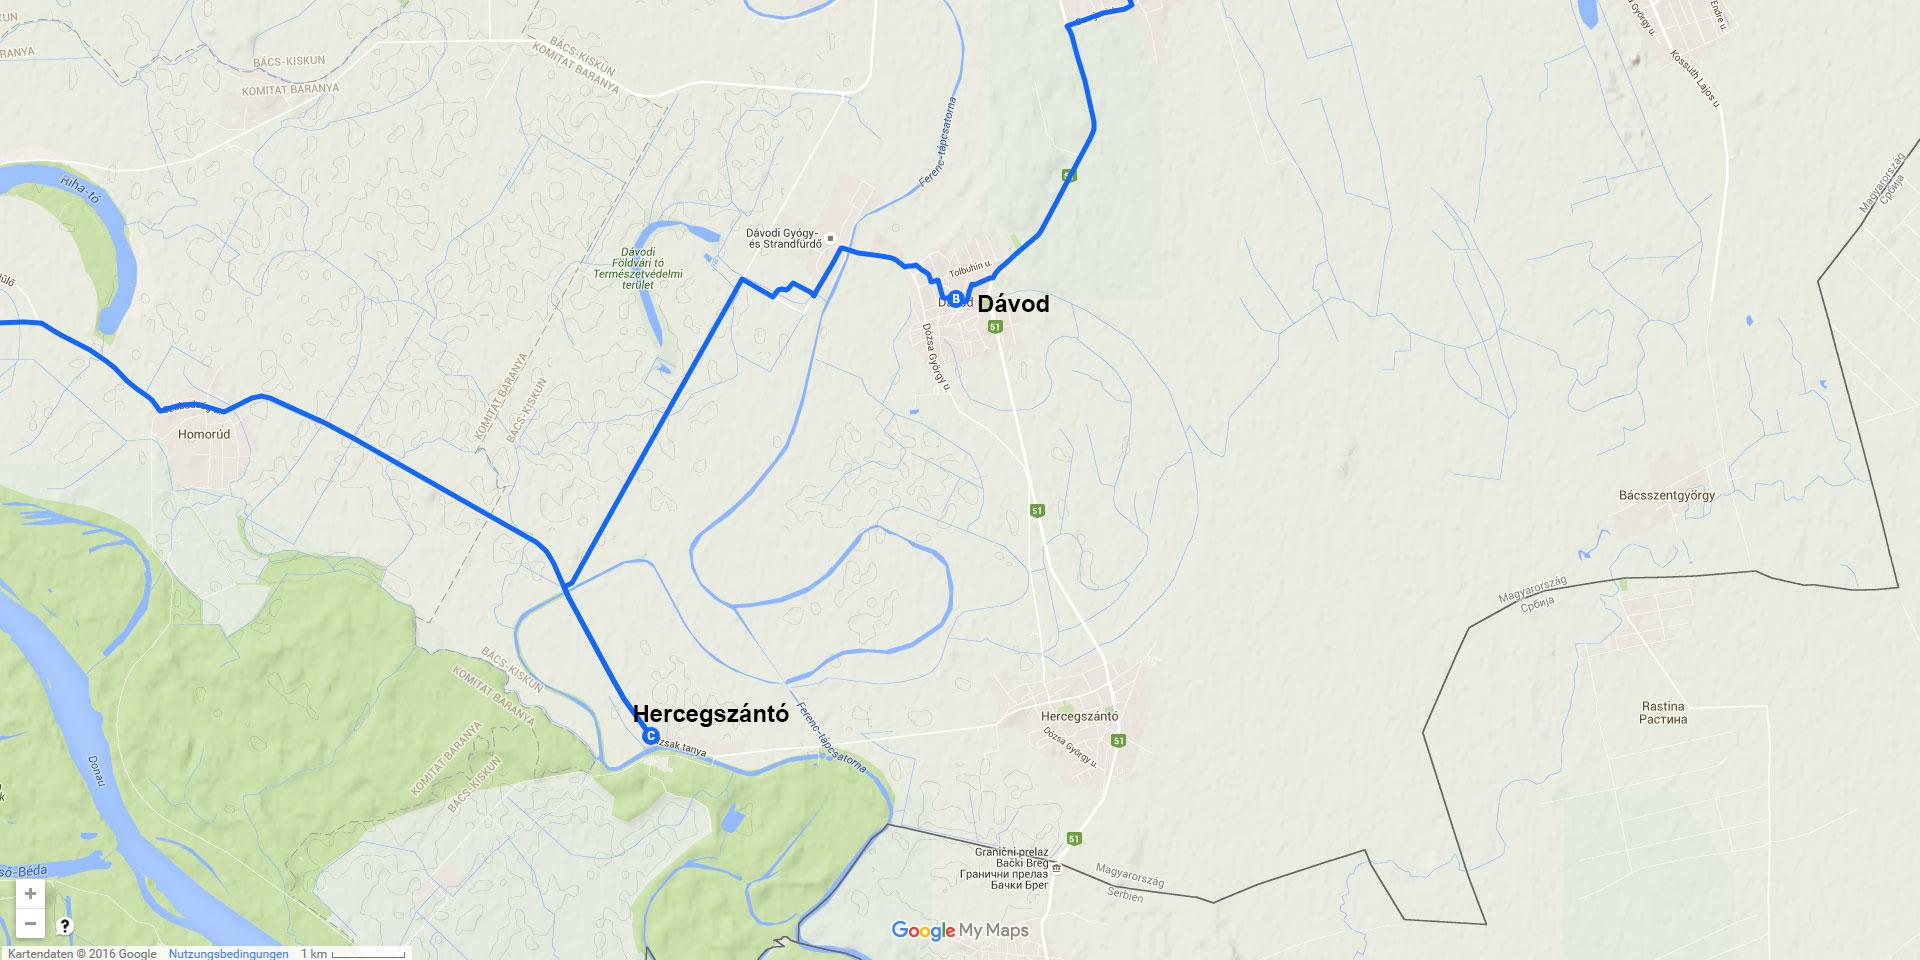 Die Tagesstrecke von Dávod nach Hercegszántó (9 km)